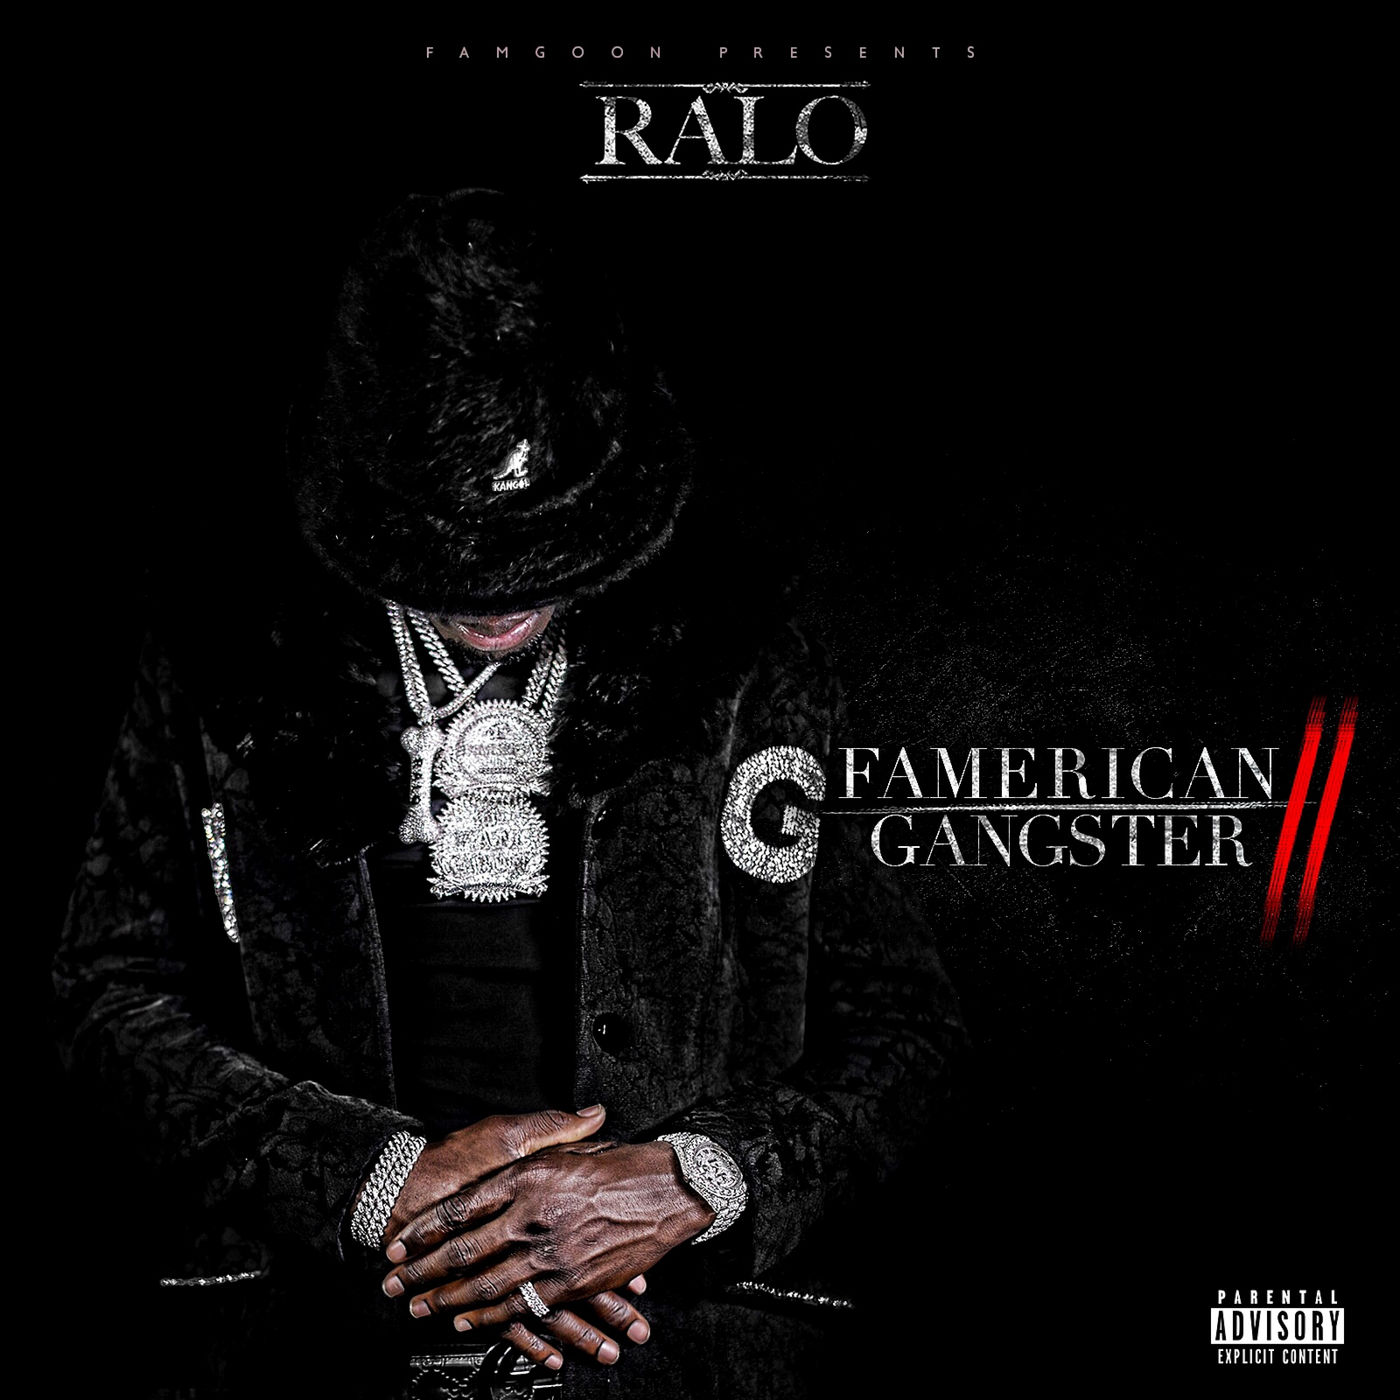 Ralo - Famerican Gangster 2 Cover